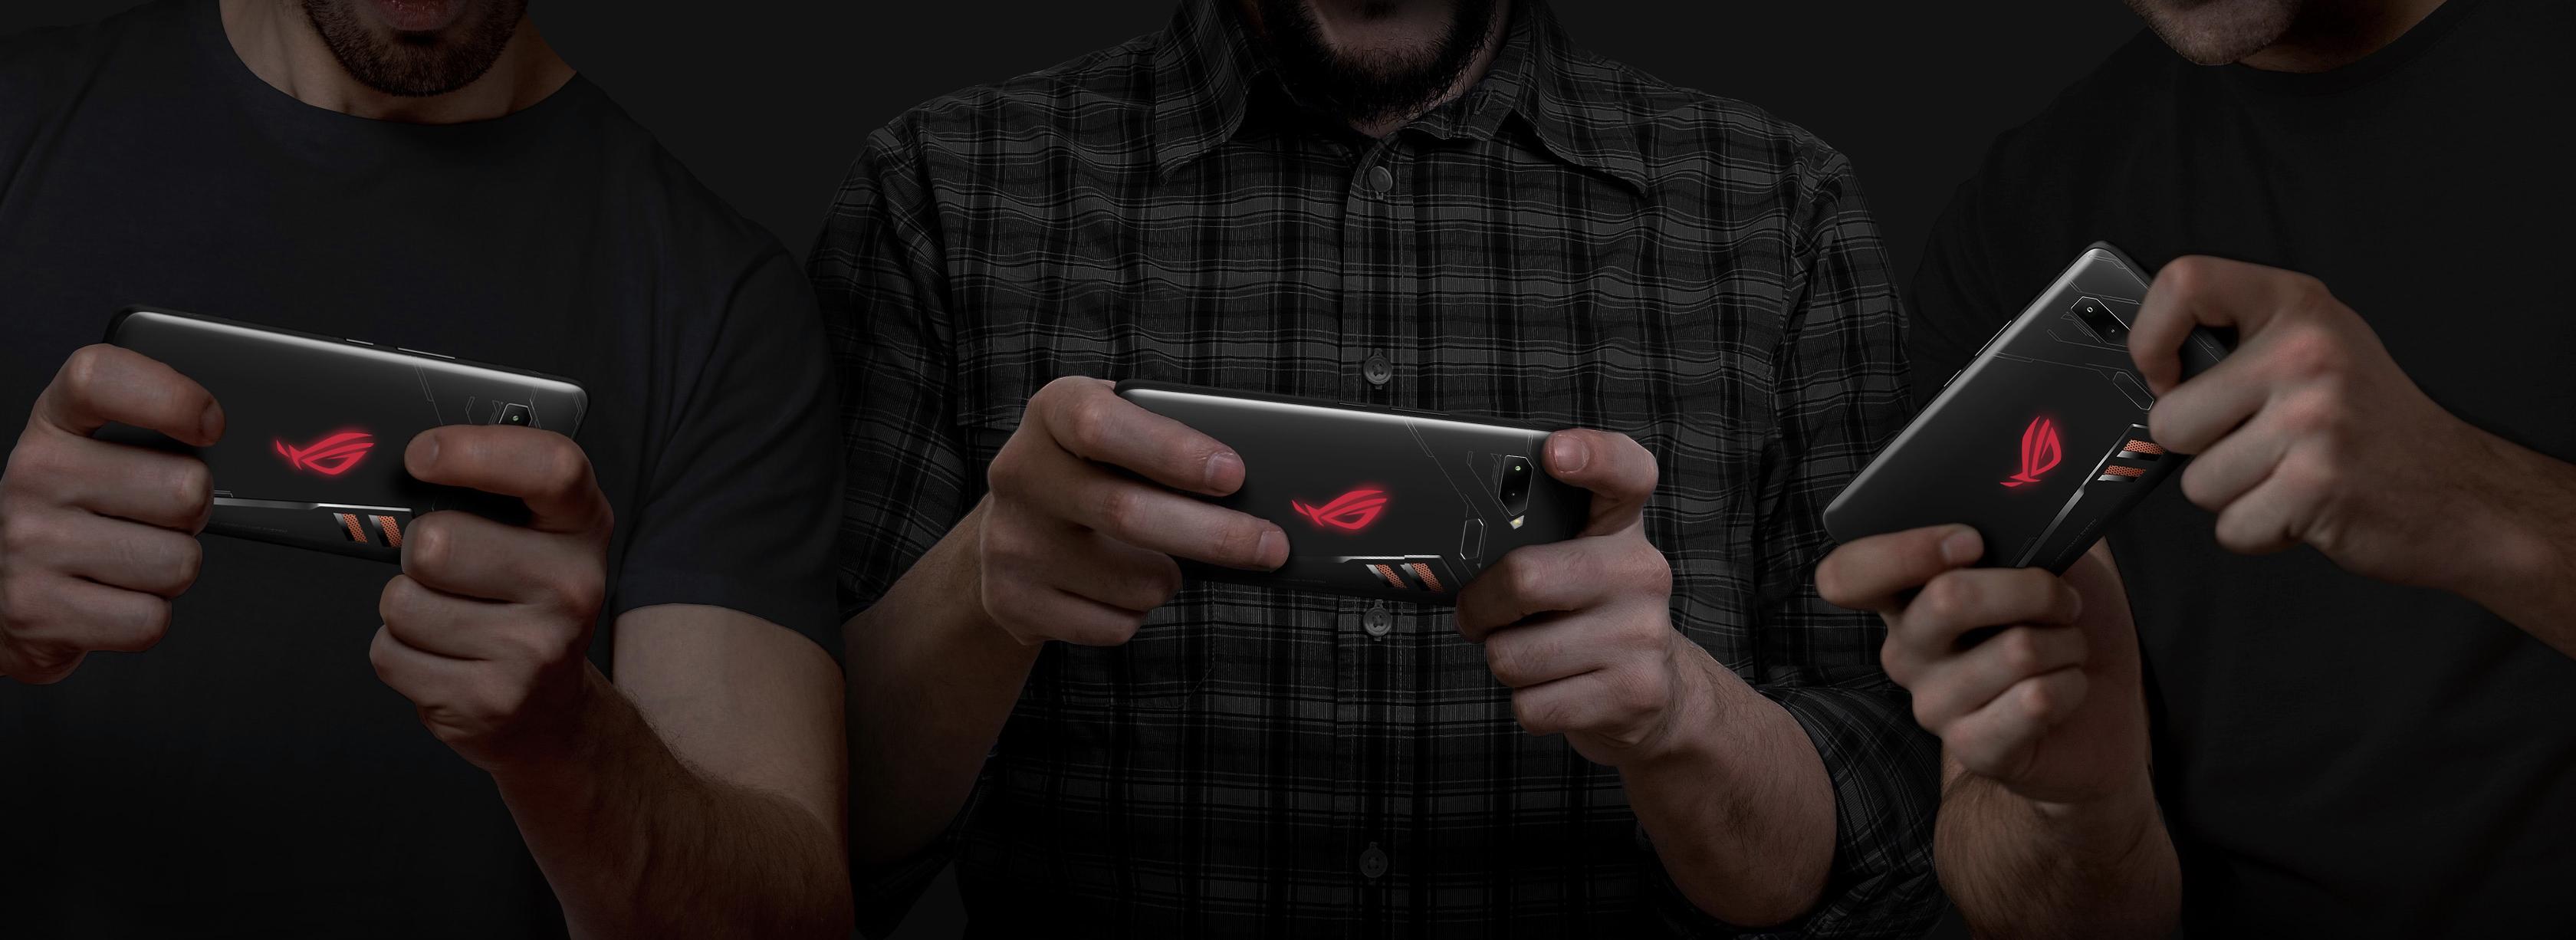 ROG Phoneの背面ライト